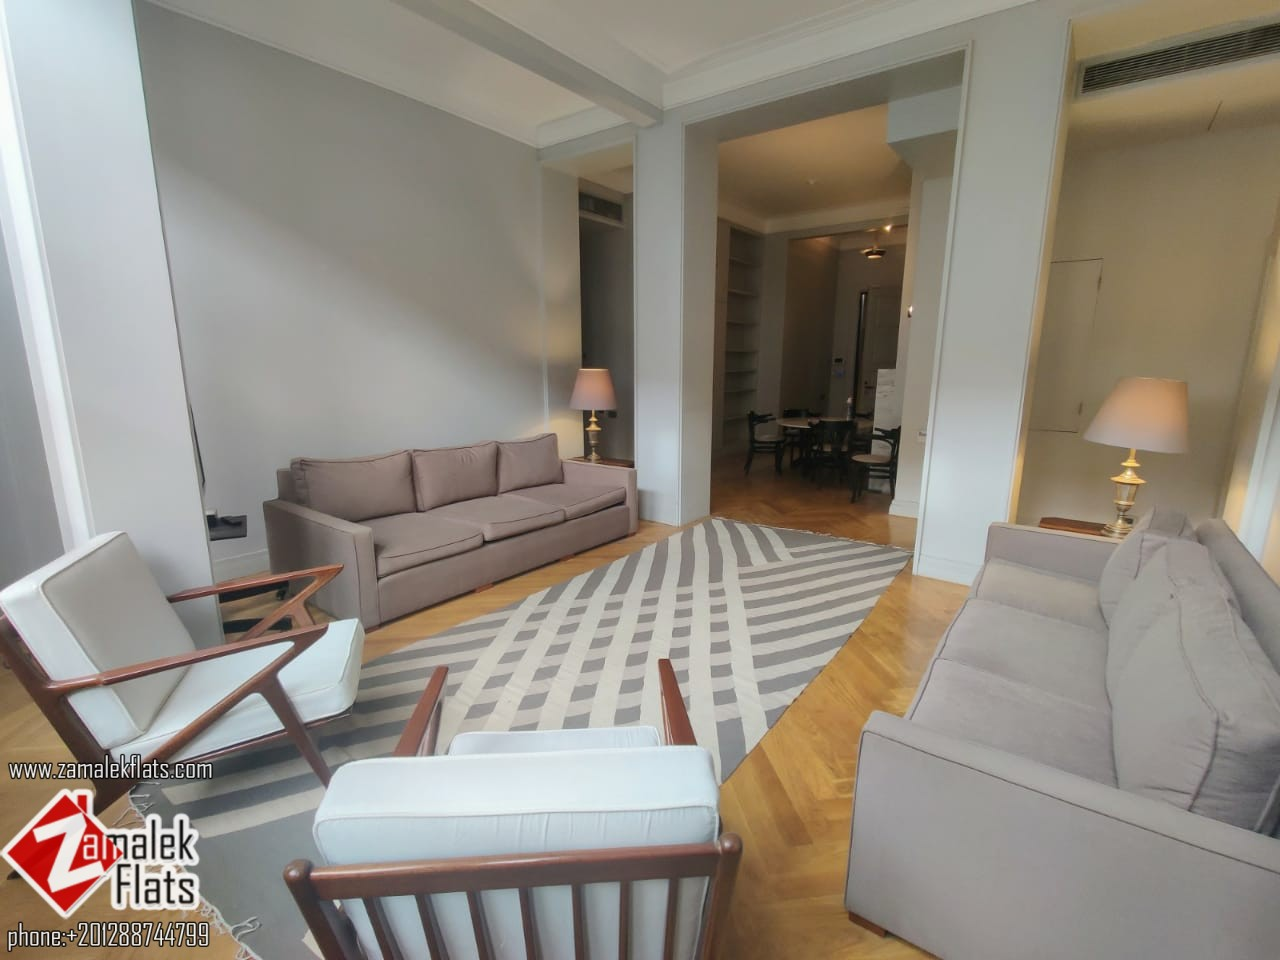 Furnished Apartment for Rent in Vintage Building in Zamalek